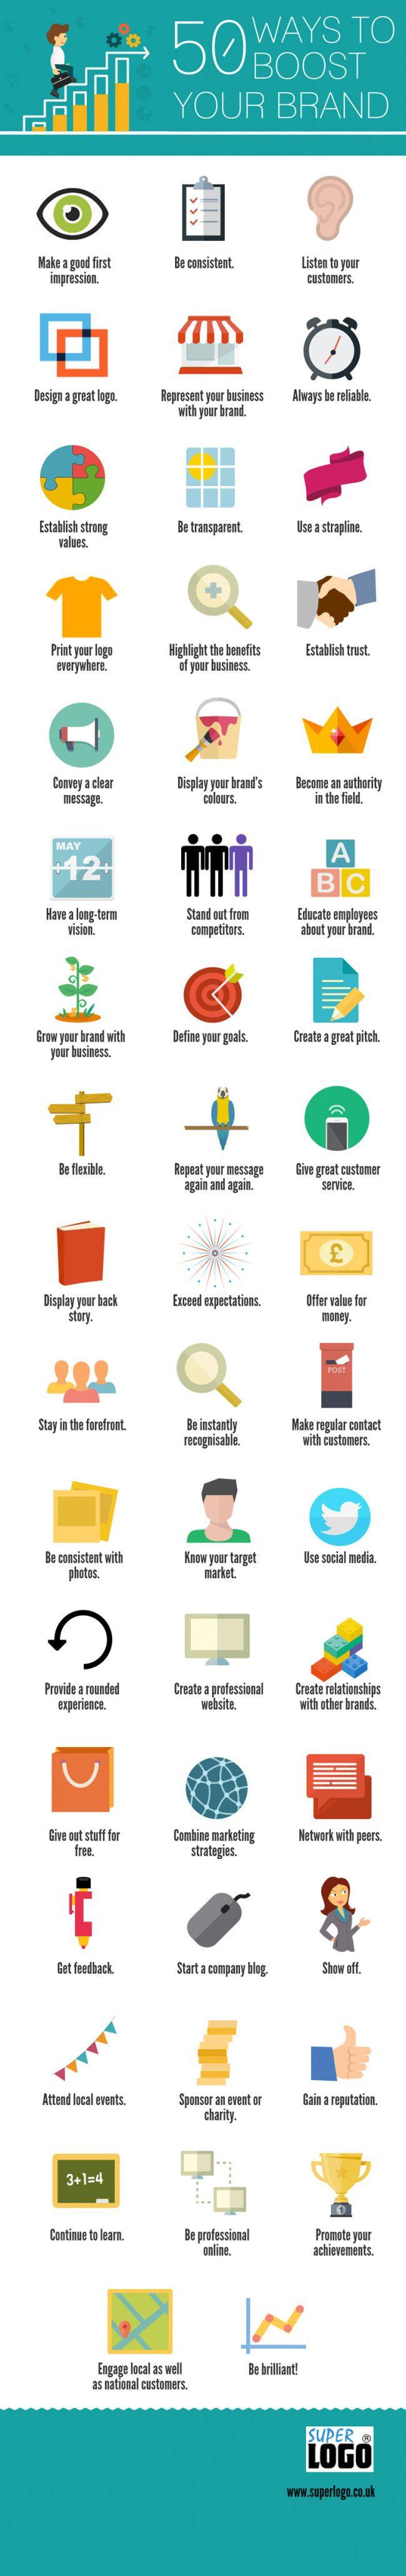 Ways To Boost Your Brand Infographic  Smashfreakz  Work